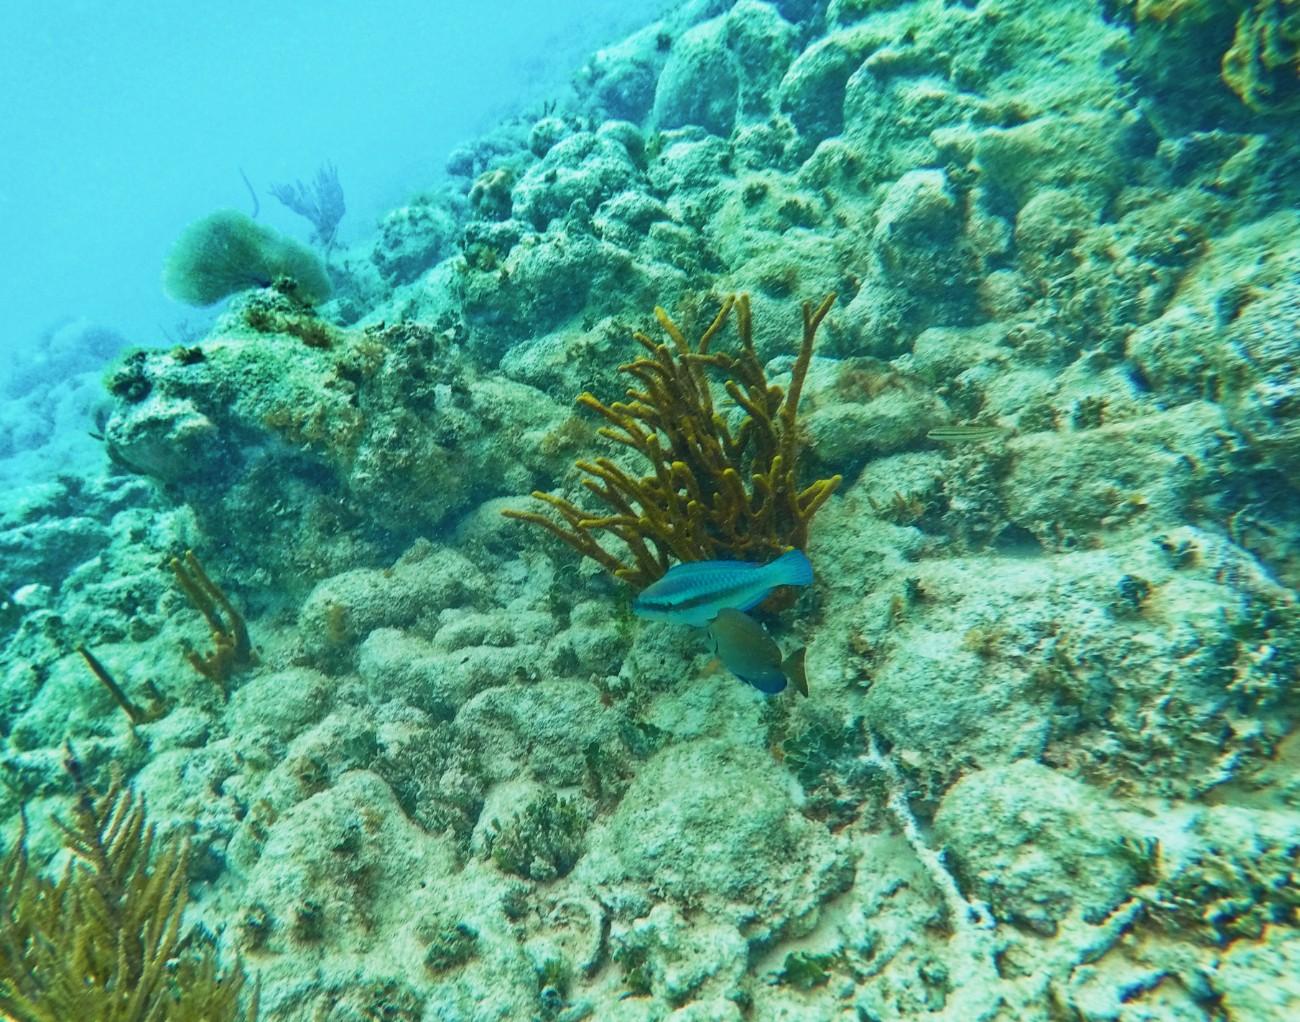 Tropical fish snorkeling Isla Palominito Puerto Rico 1